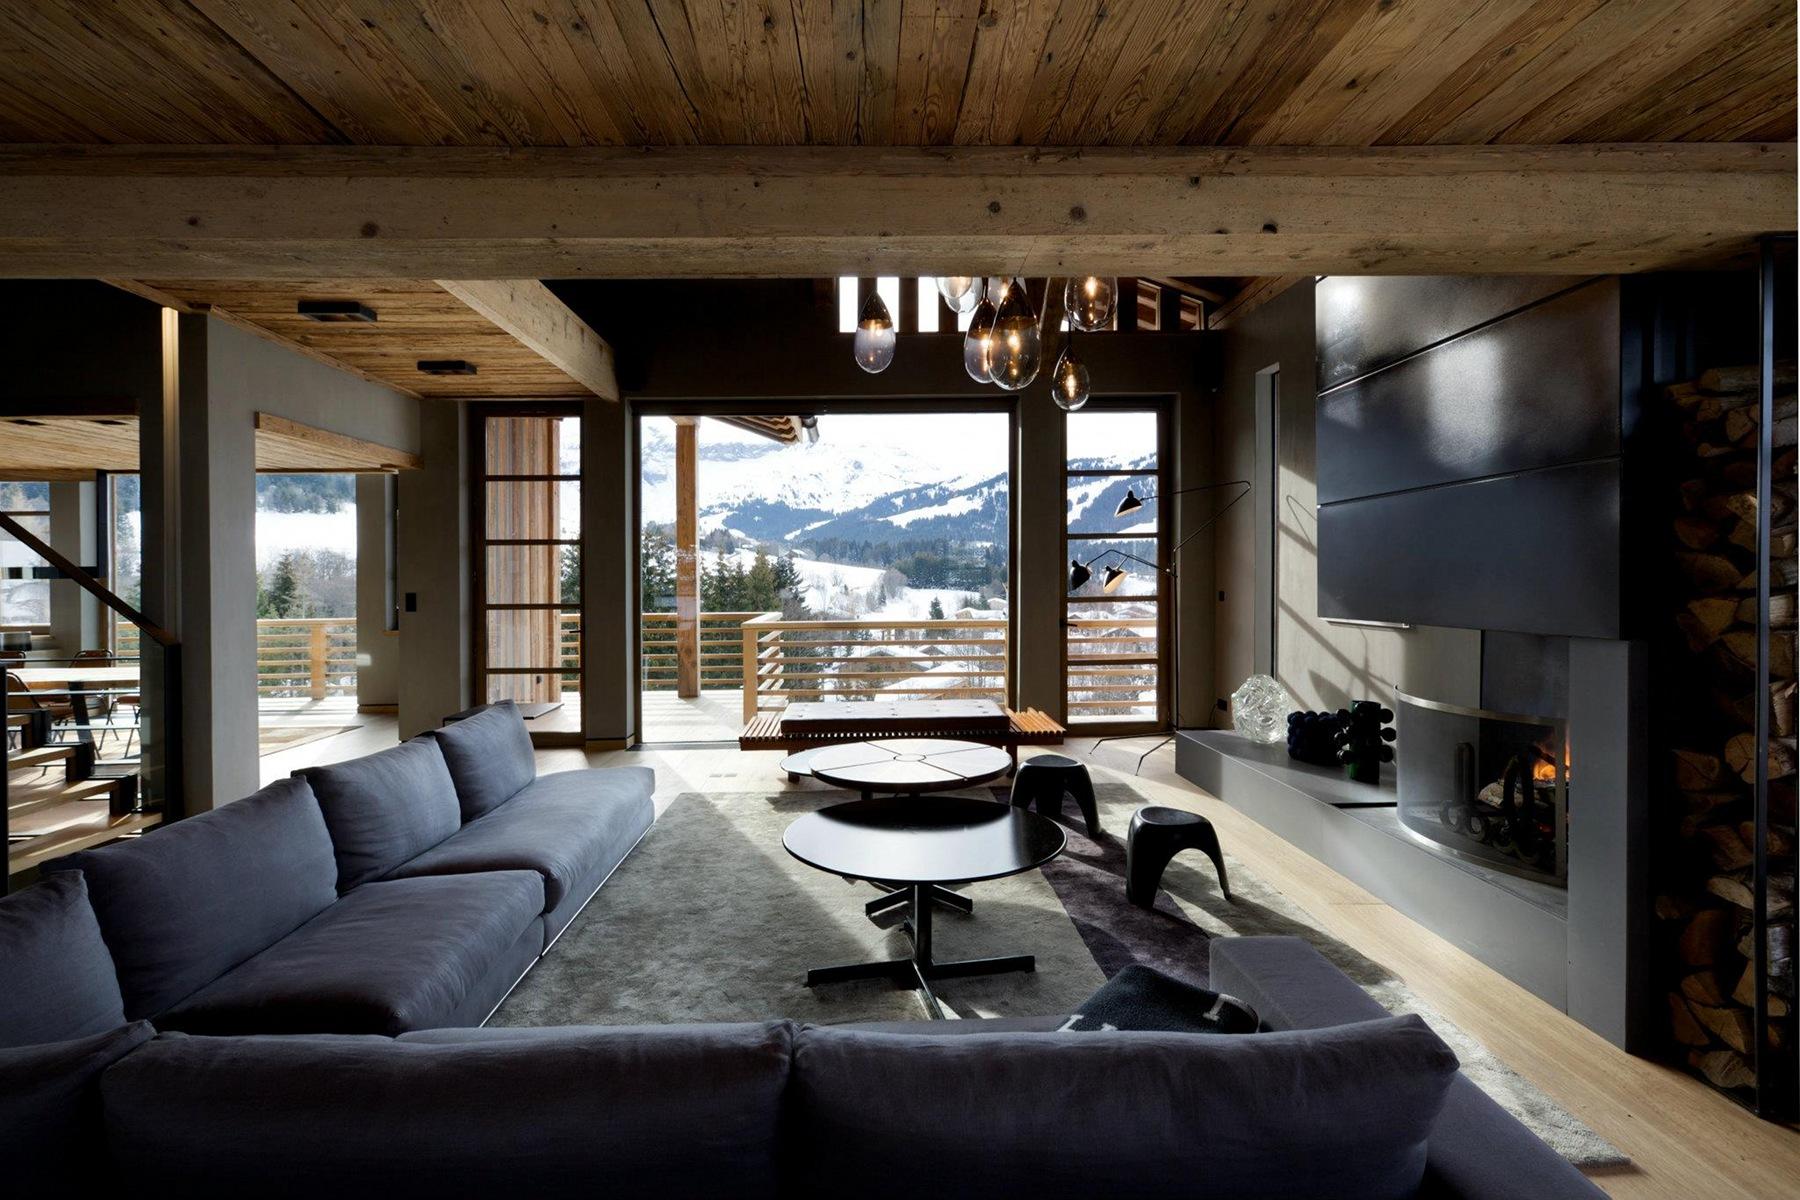 Интересный интерьер дома